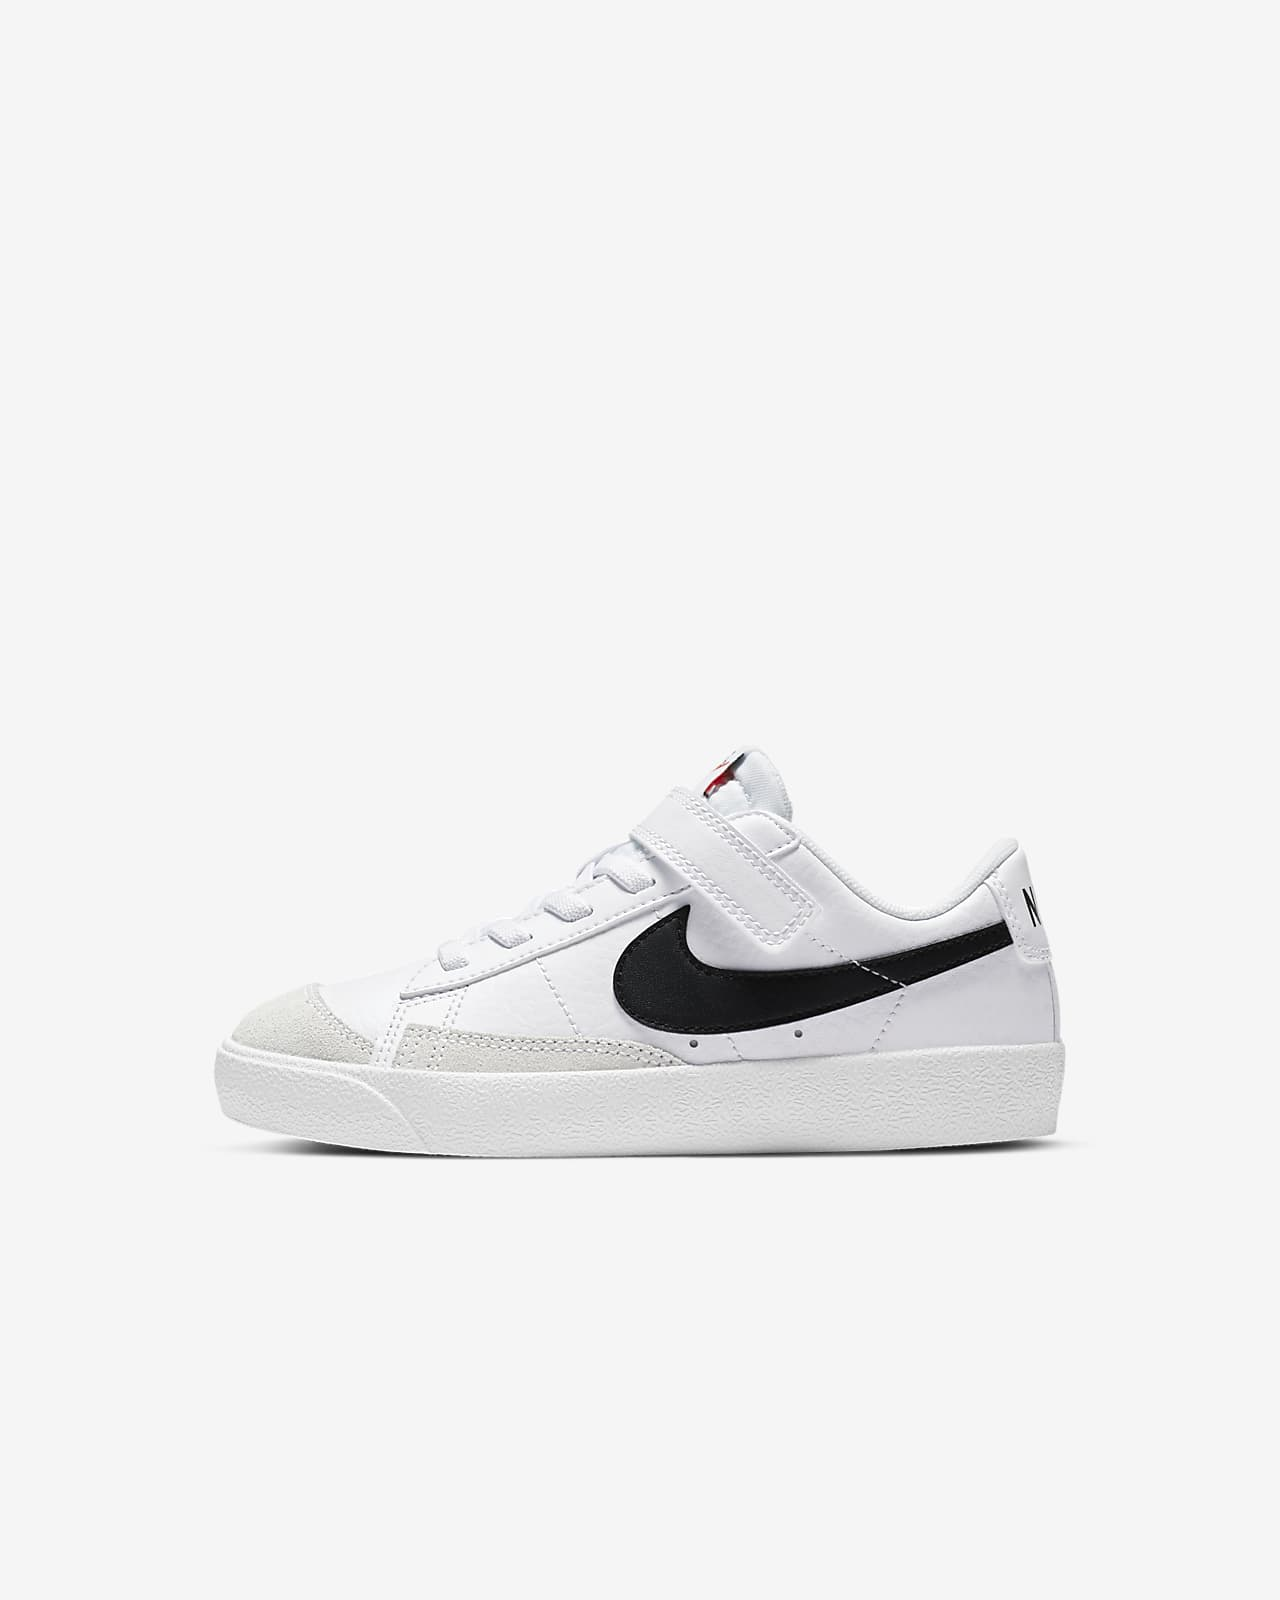 Calzado para niños talla pequeña Nike Blazer Low '77